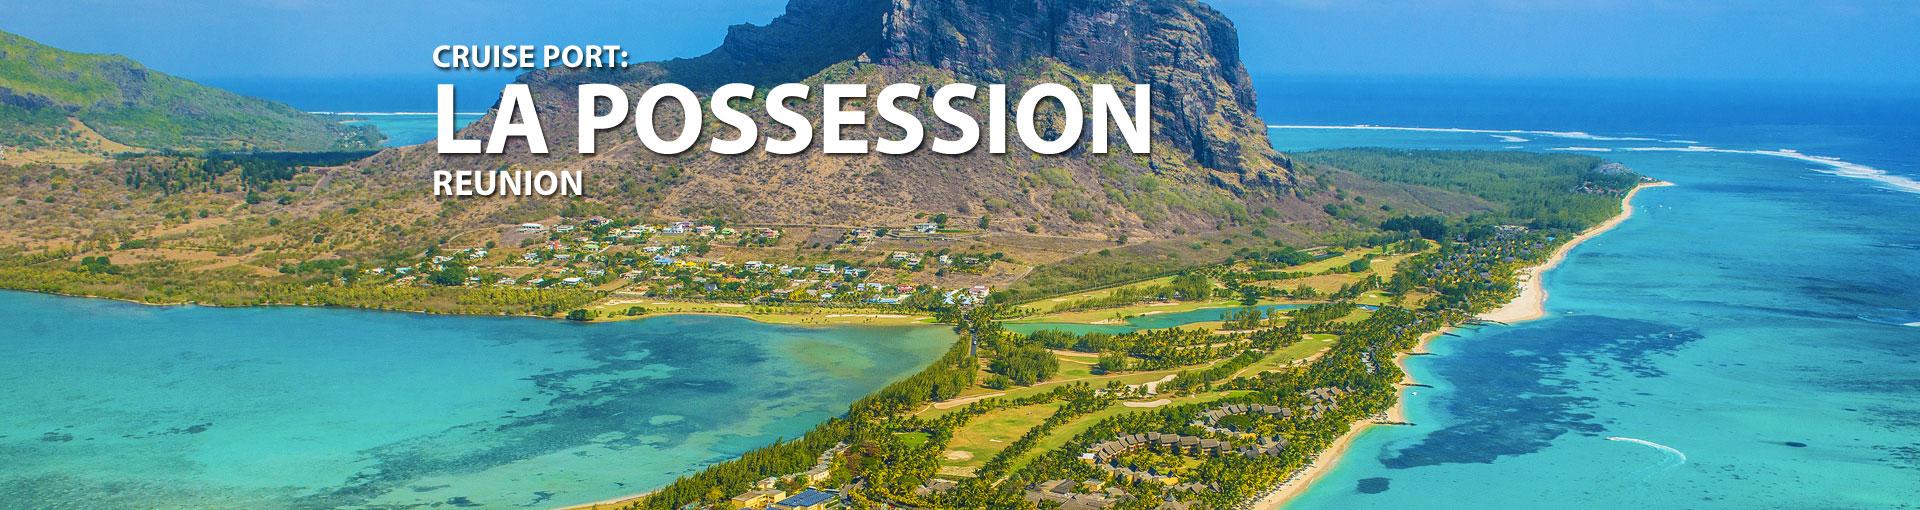 Cruises to La Possession, Reunion